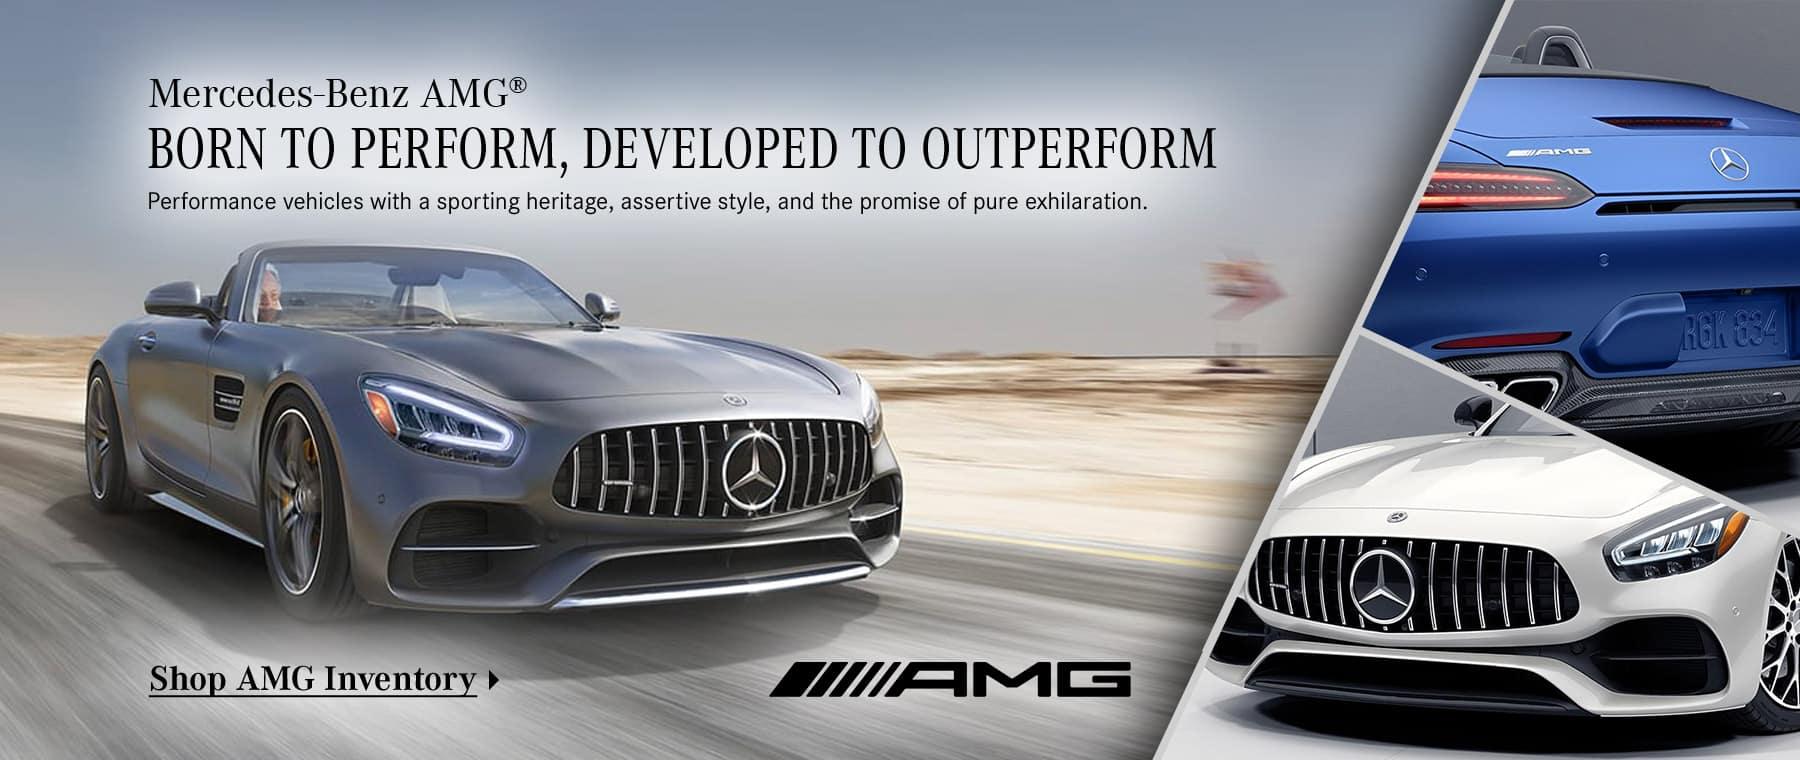 Homepage-Slider-MBH-AMG®